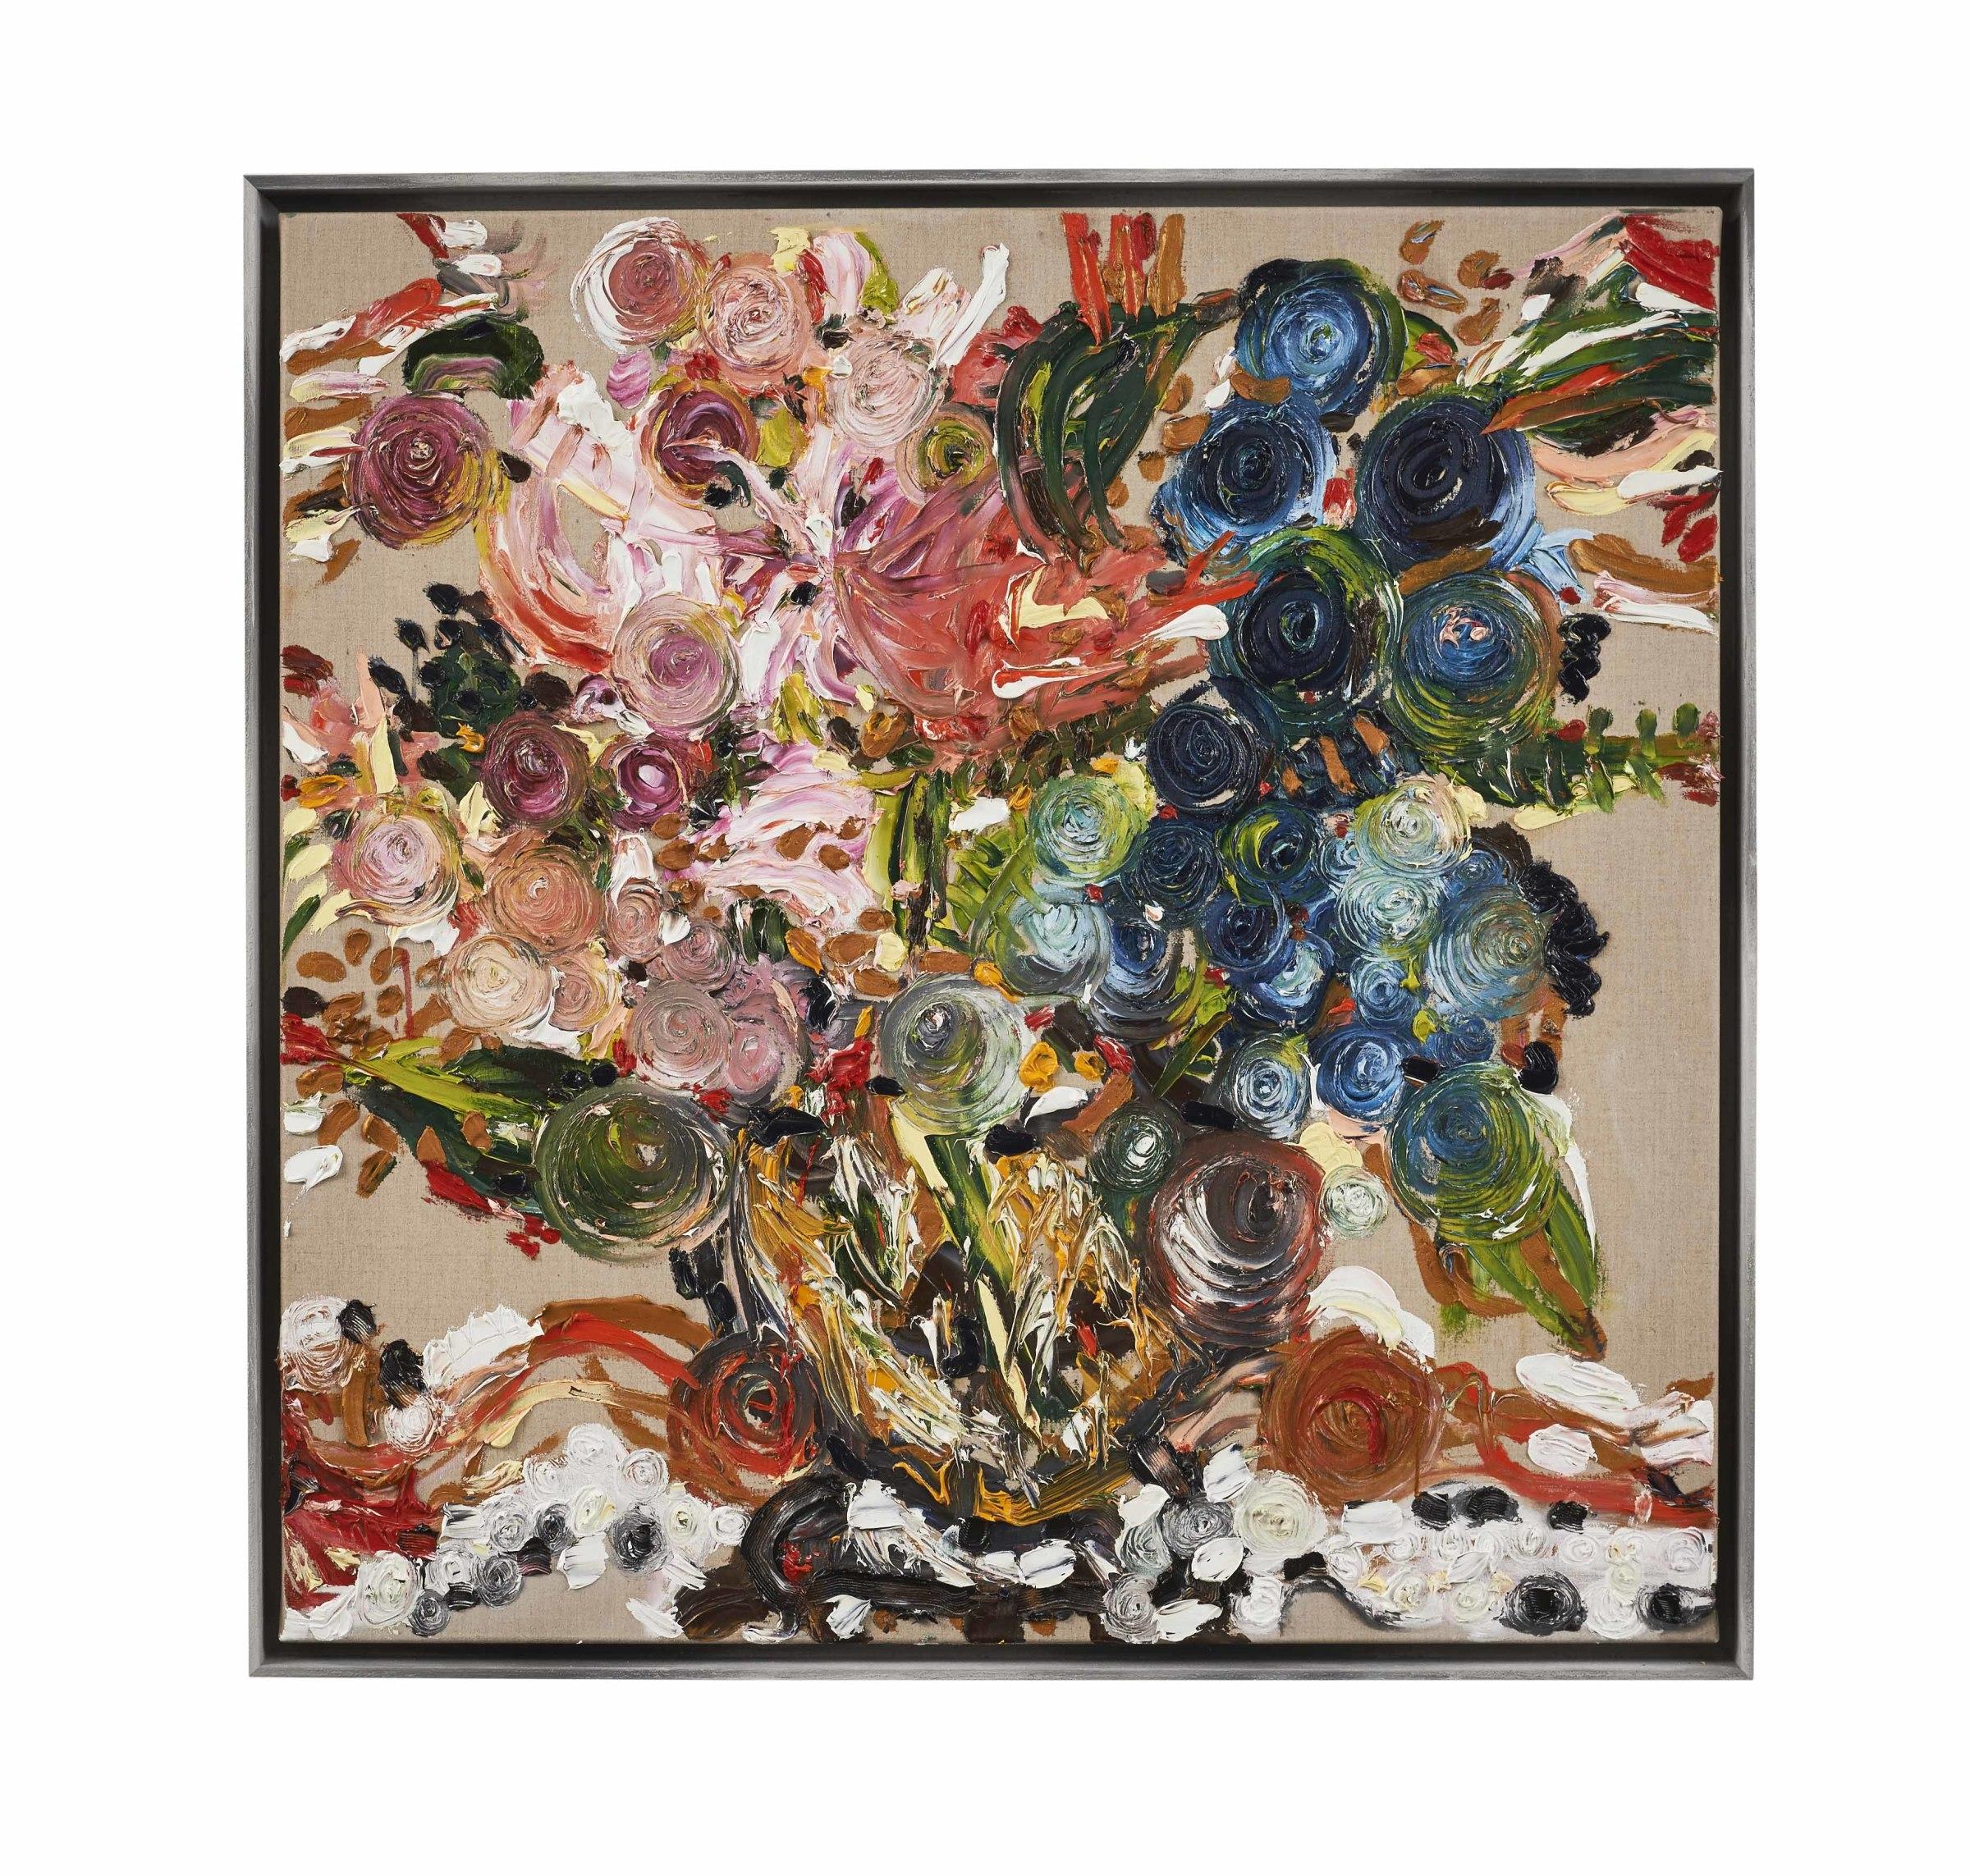 <span class=&#34;link fancybox-details-link&#34;><a href=&#34;/exhibitions/16/works/artworks3935/&#34;>View Detail Page</a></span><div class=&#34;artist&#34;><strong>Maarten Vrolijk</strong></div><div class=&#34;title&#34;><em>Flowers in Terracotta</em>, 2017</div><div class=&#34;dimensions&#34;>100 x 100 cm</div>